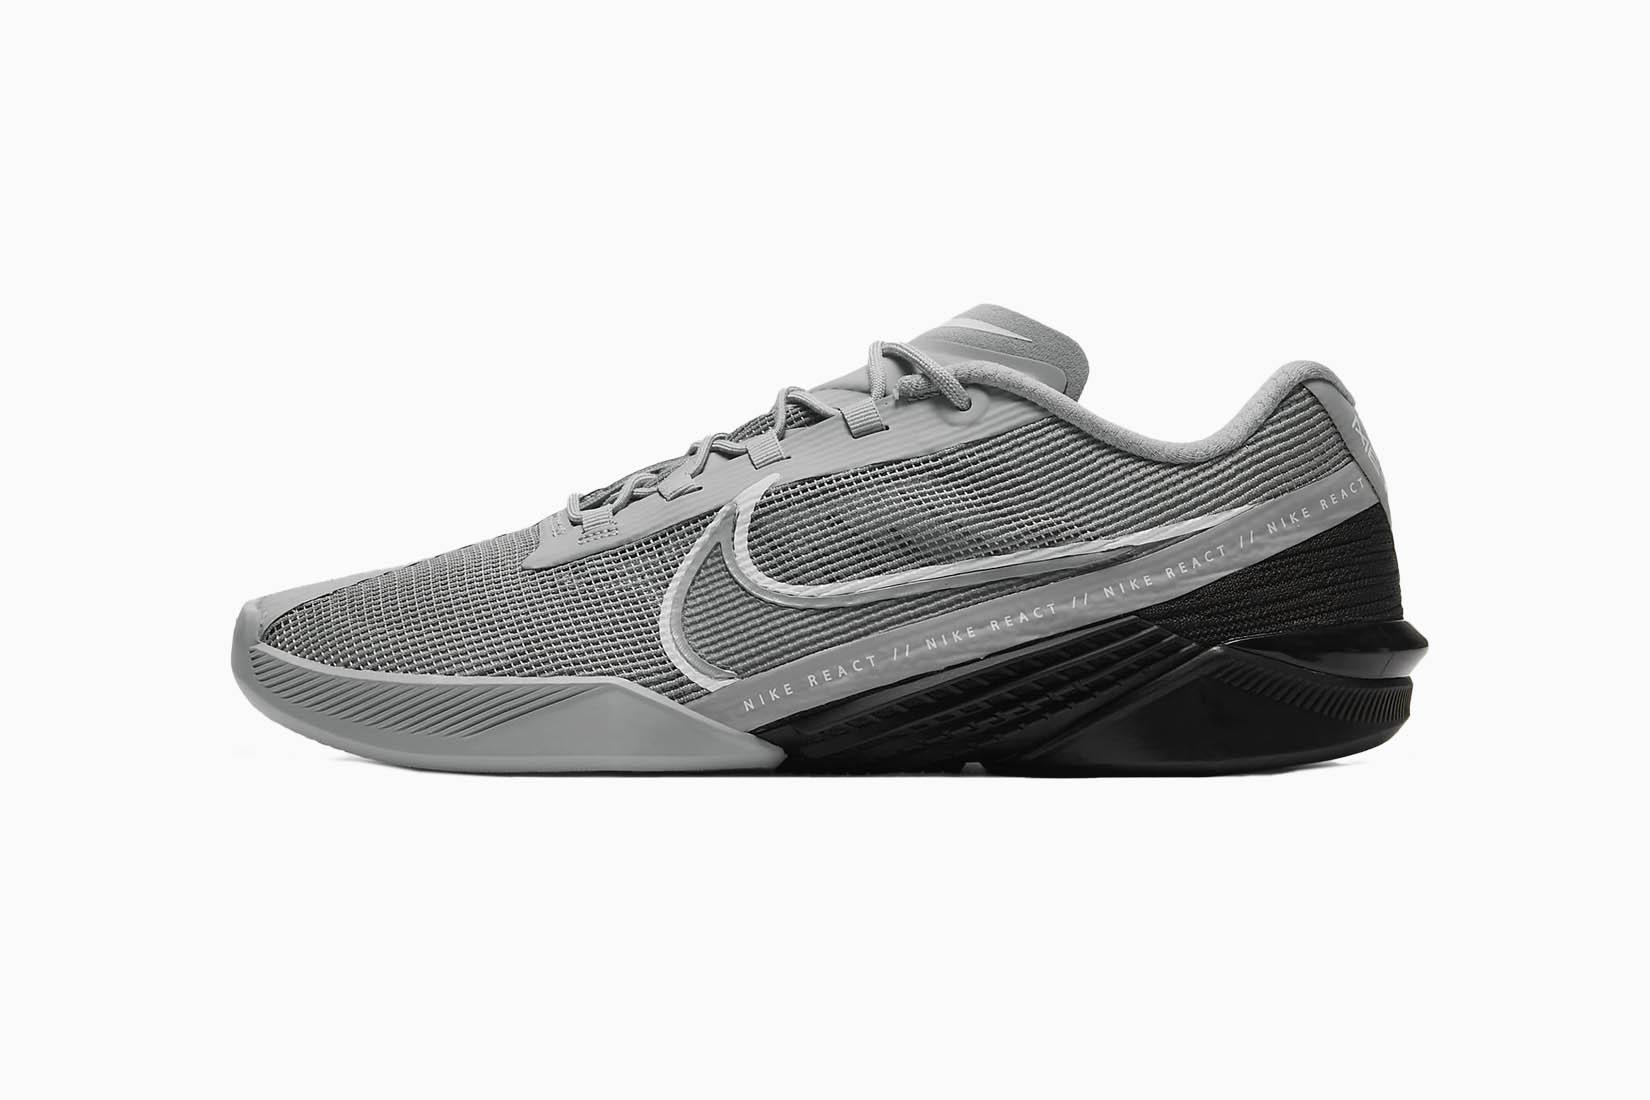 best nike running shoes men nike react metcon training shoe review Luxe Digital